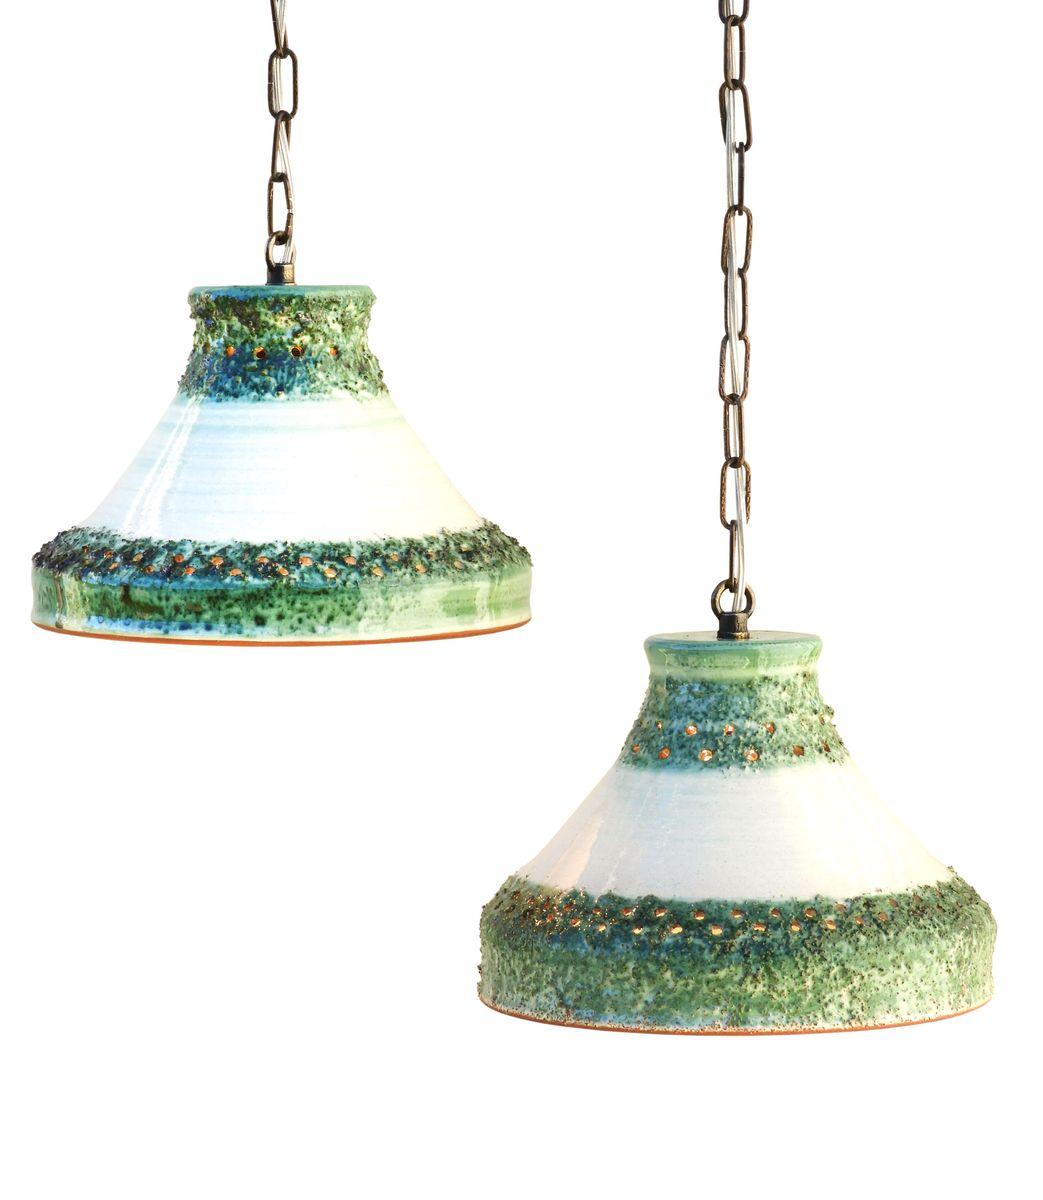 Vintage Hängelampen aus Keramik, 1970er, 2er Set